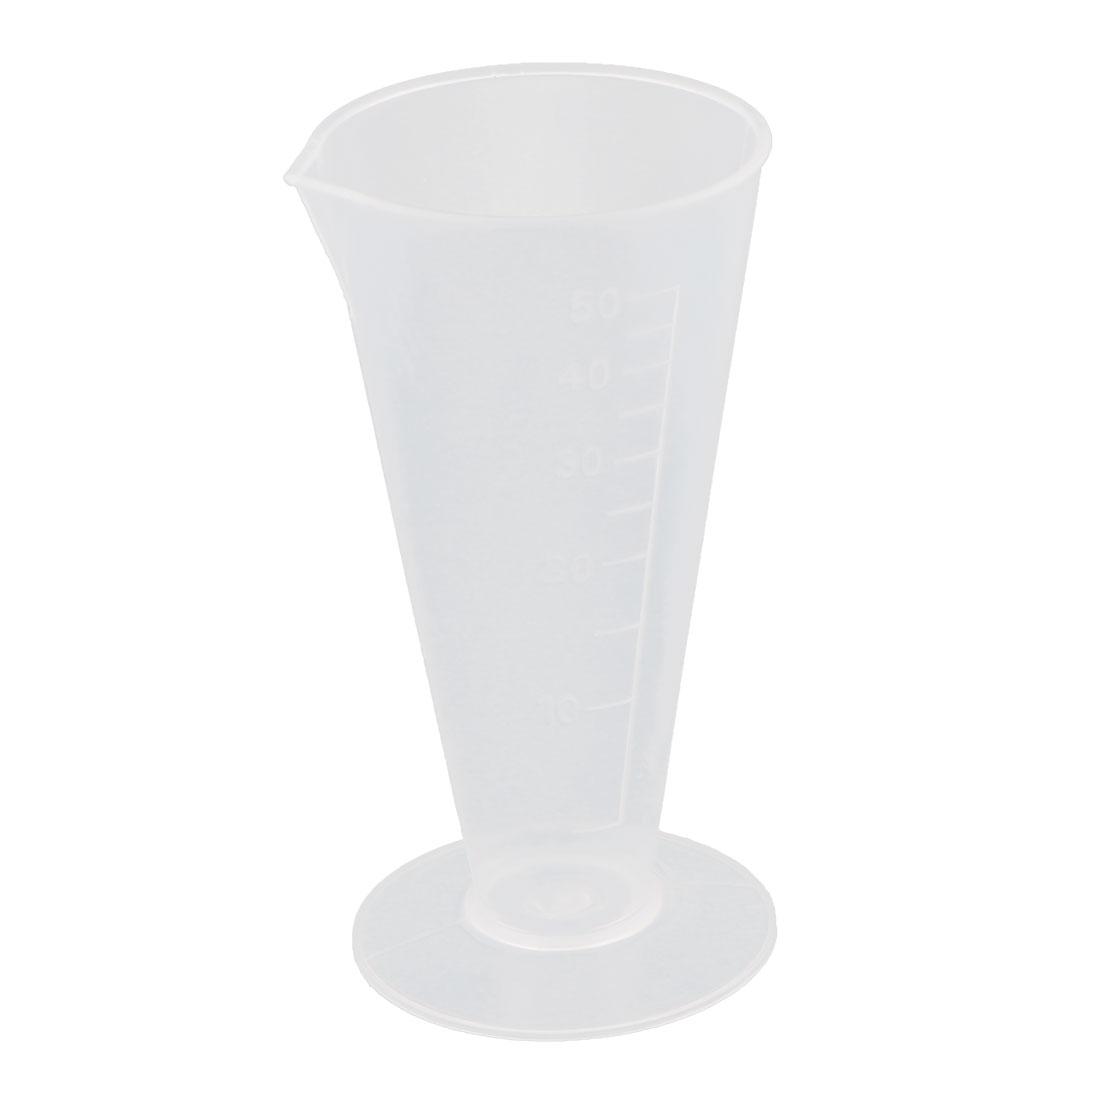 Lab Plastic Graduation Scale Beaker Experiment Measuring Cup 50ml